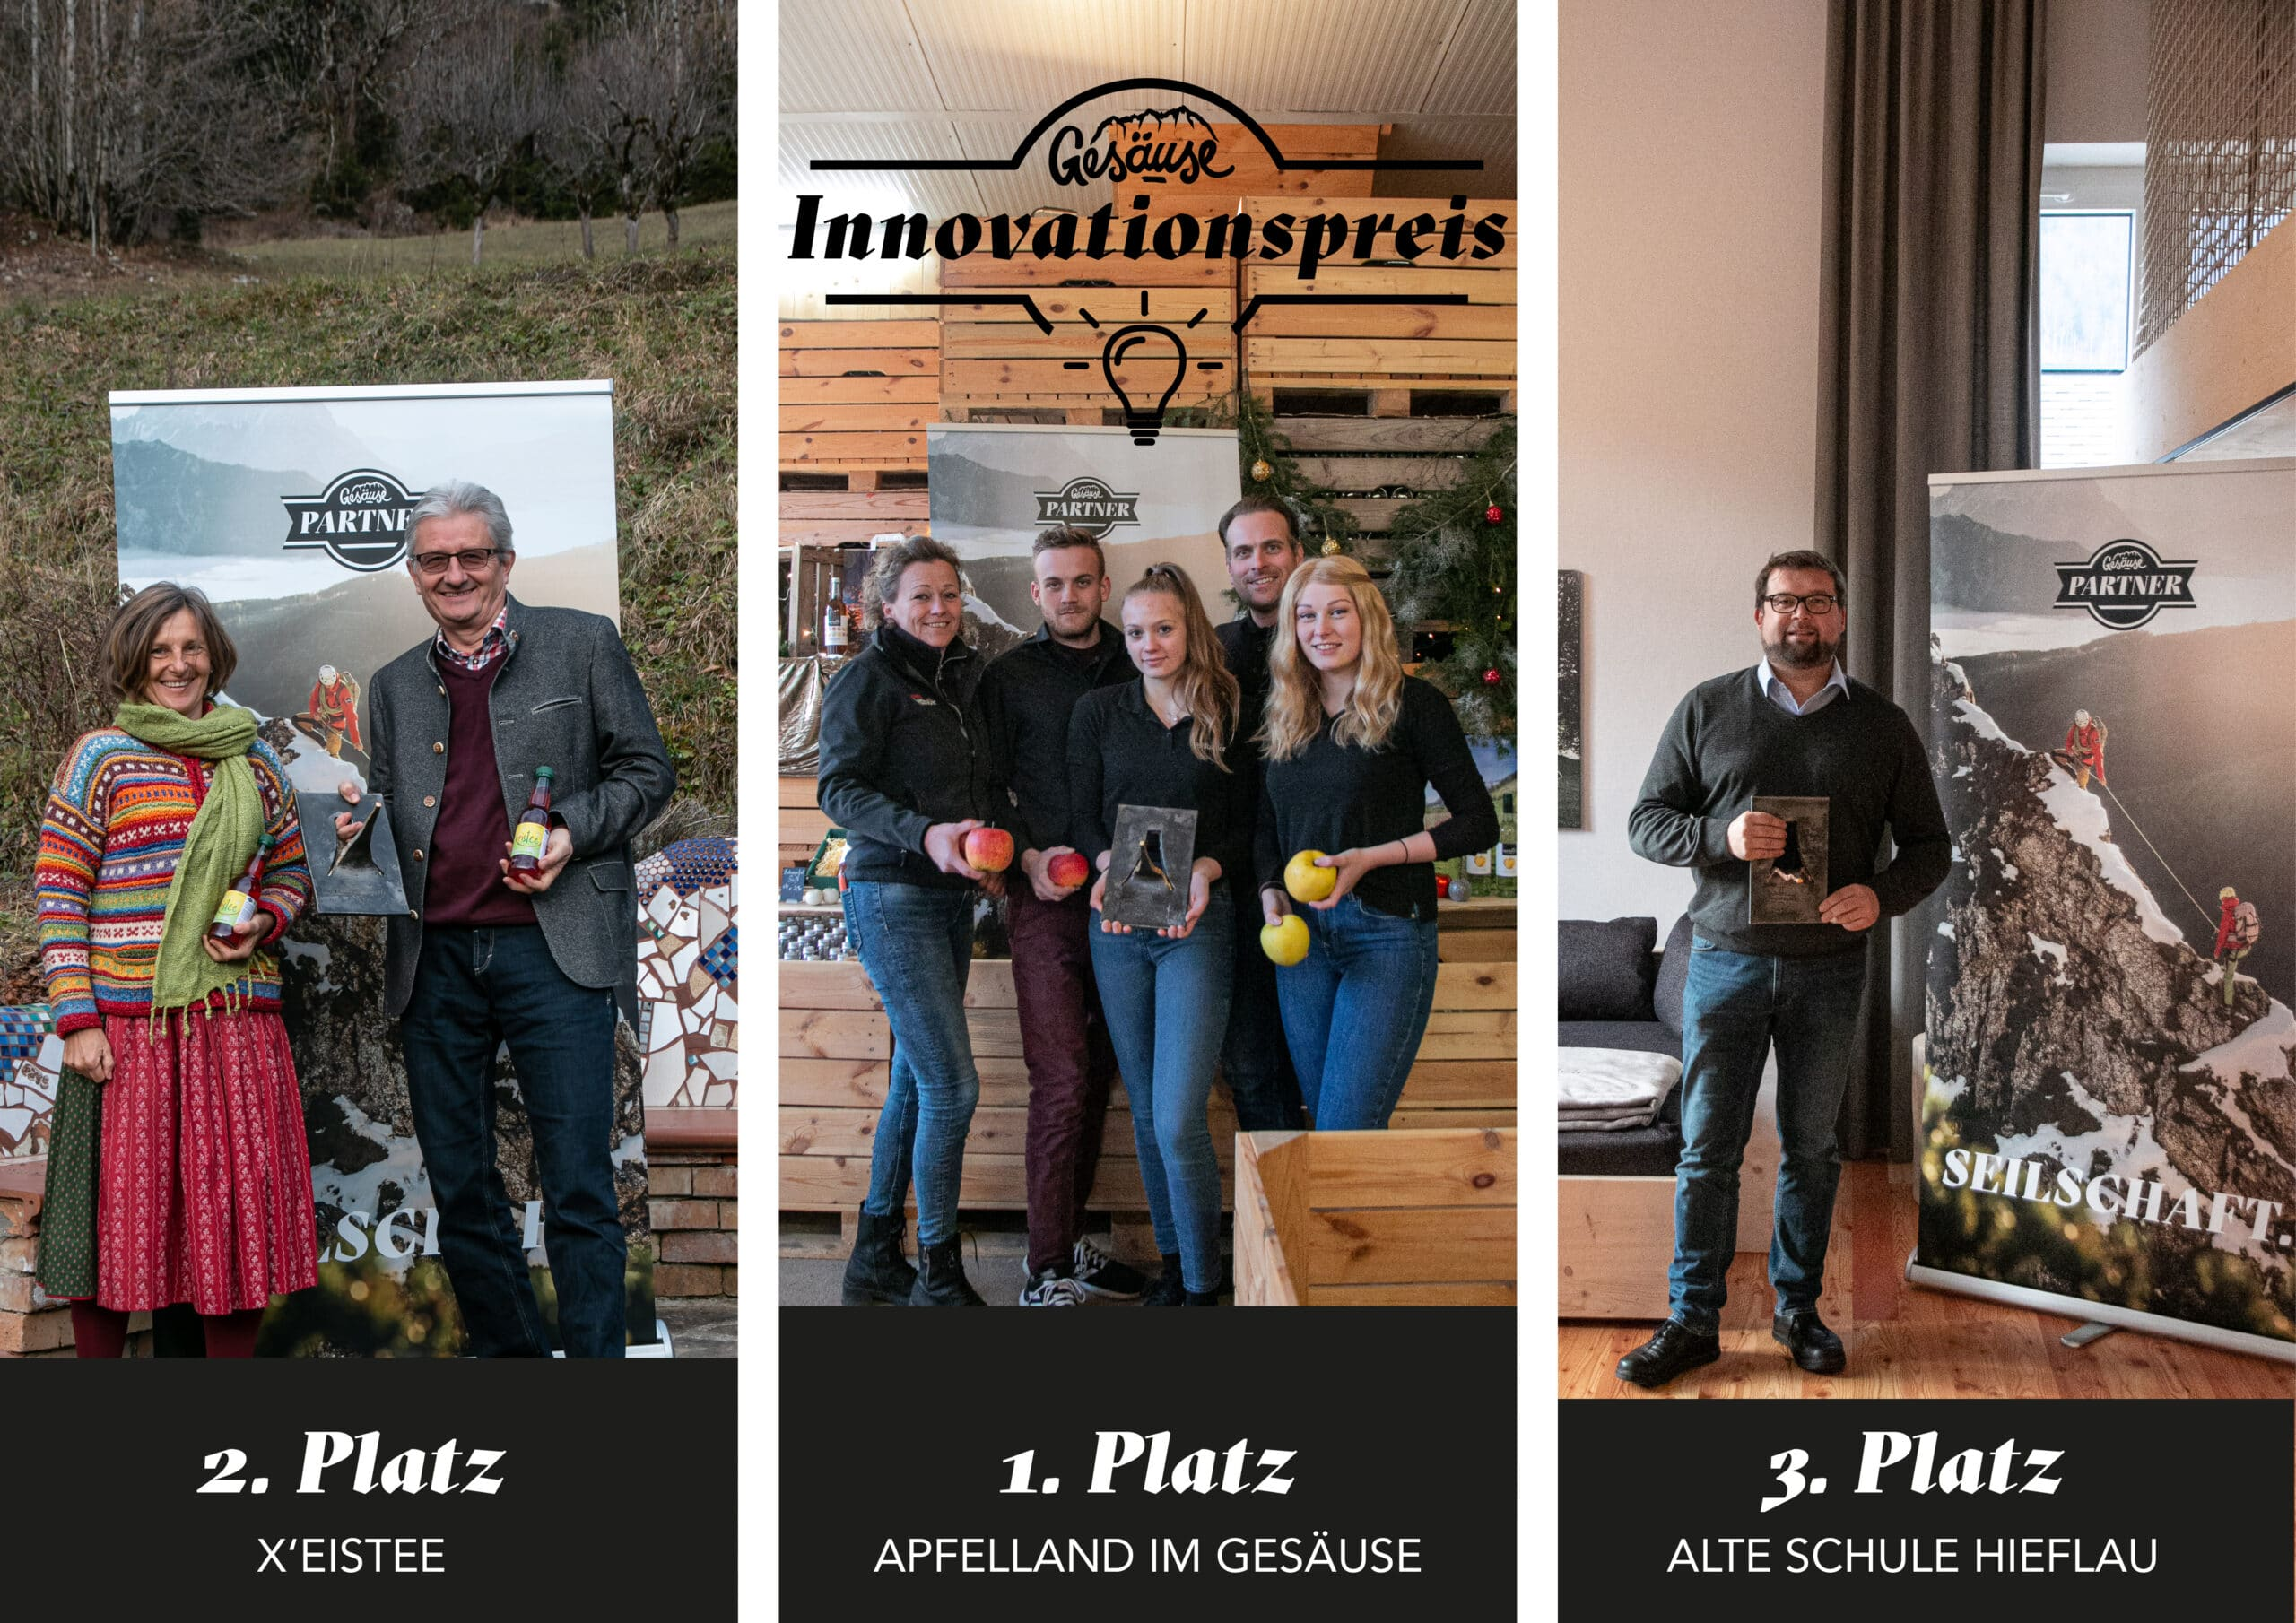 Innovationspreis Foto